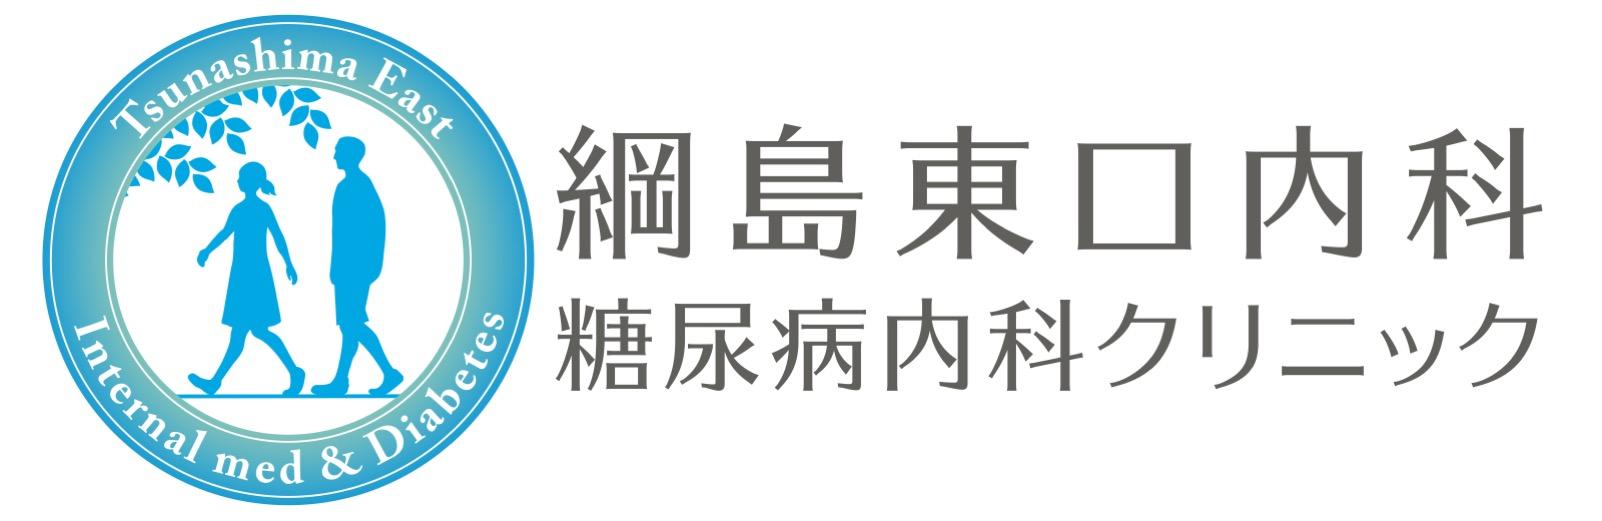 <b>綱島東口内科・糖尿病内科クリニック</b>